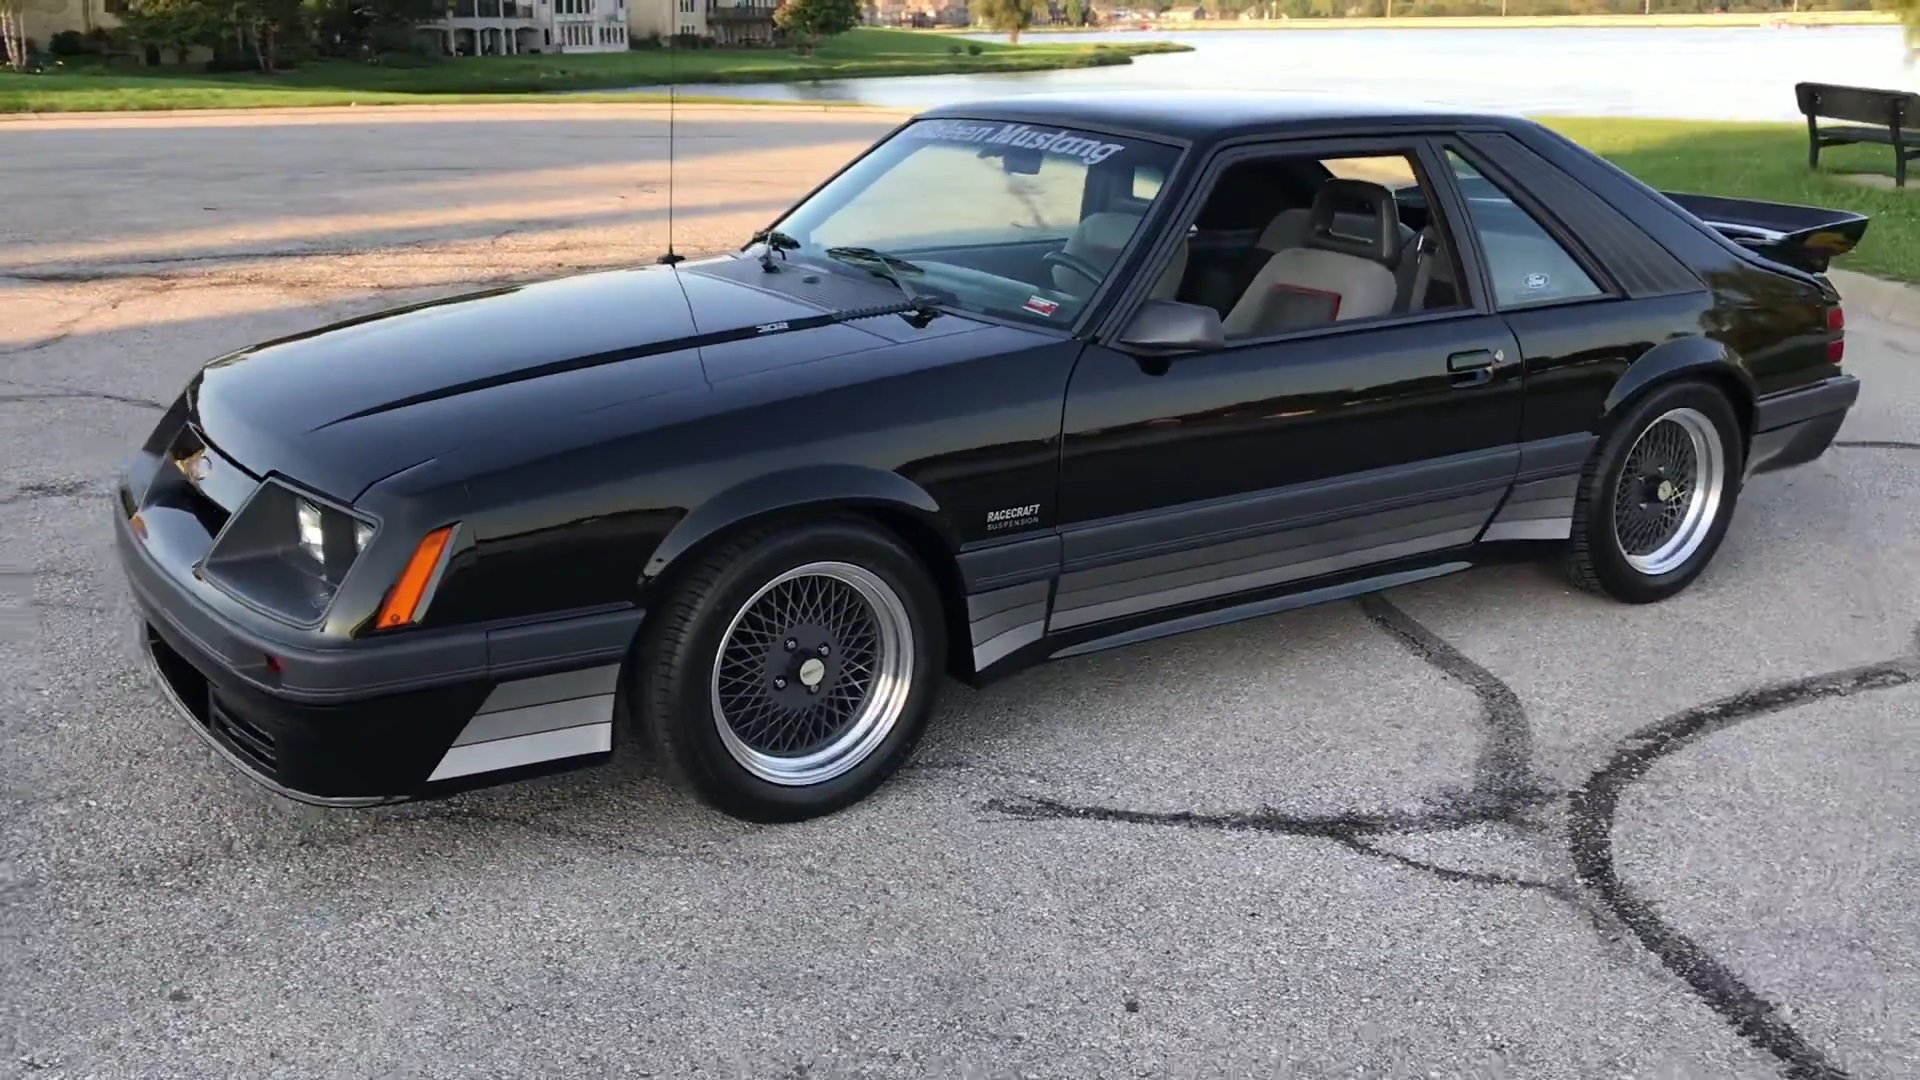 Video: 1986 Saleen Mustang Full Tour